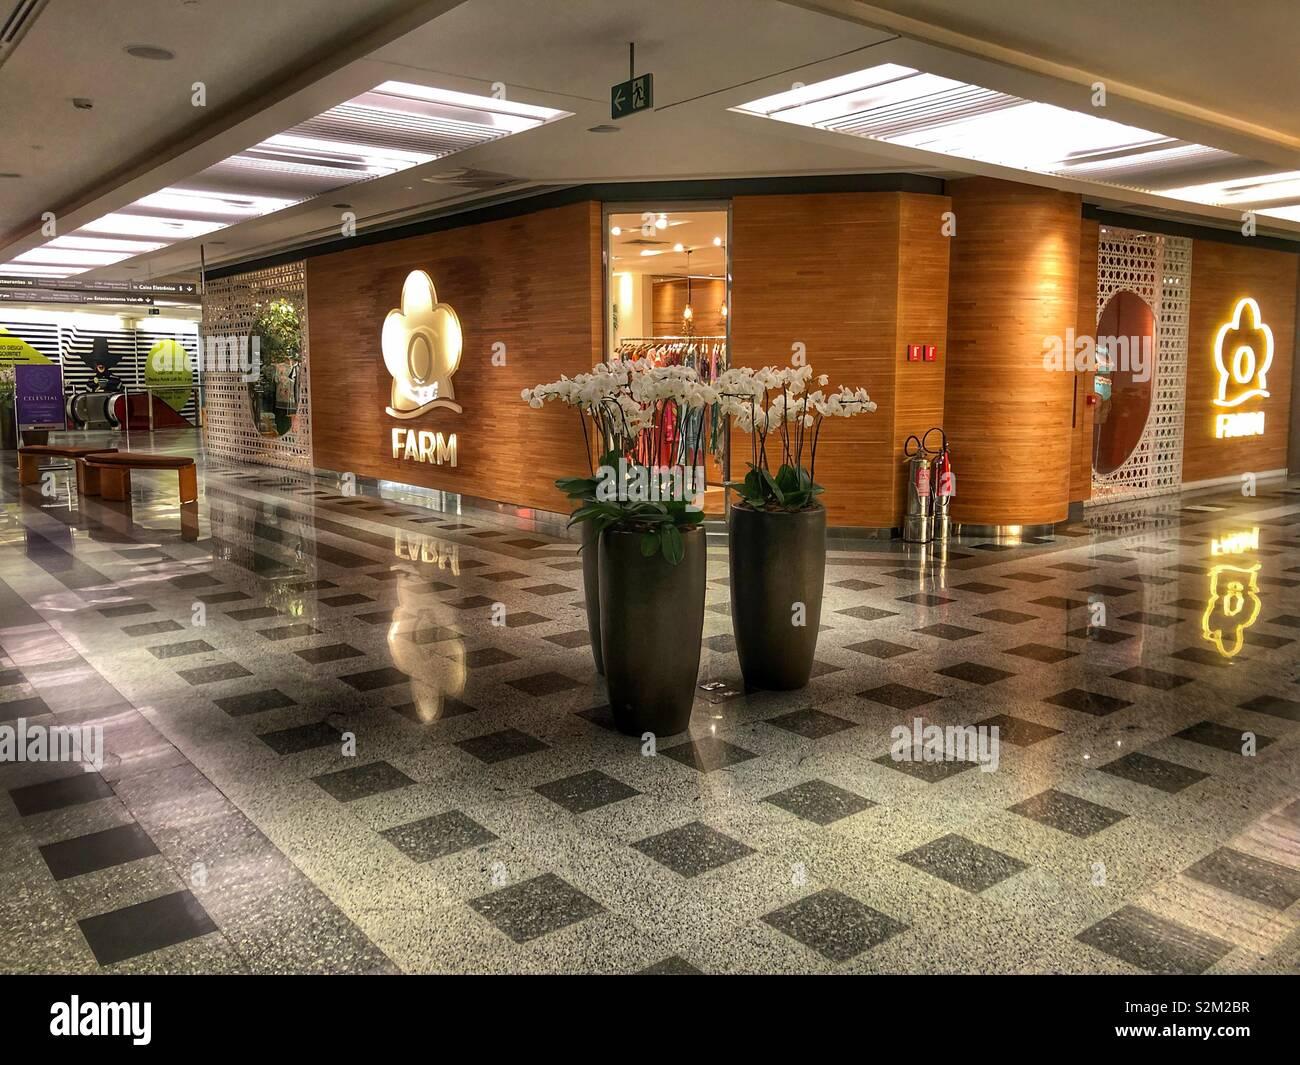 The interior of an upscale shopping mall in Ipanema, Rio de Janeiro, Brazil. - Stock Image